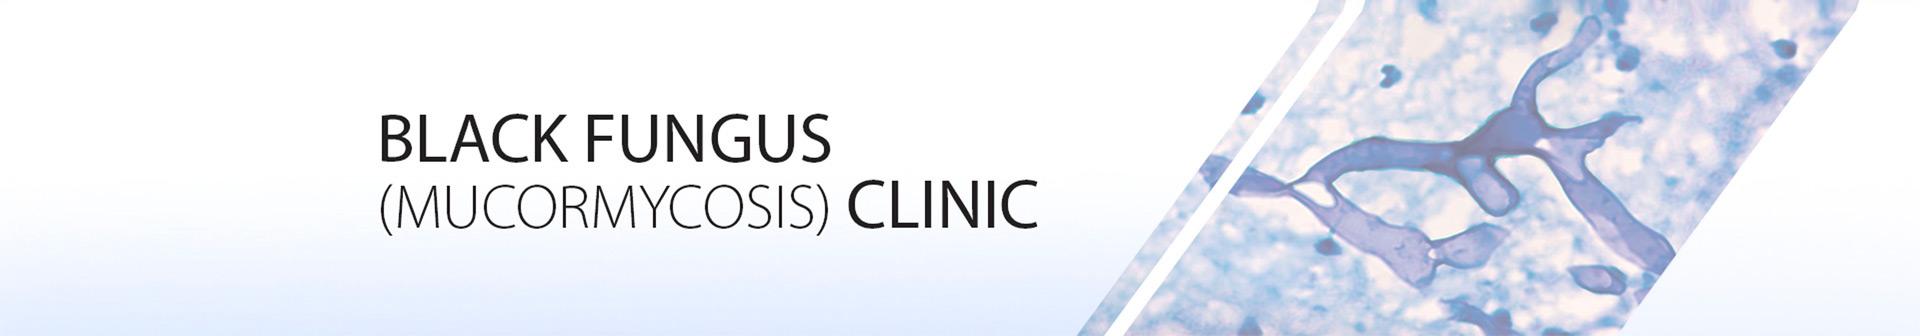 Black Fungus Clinic